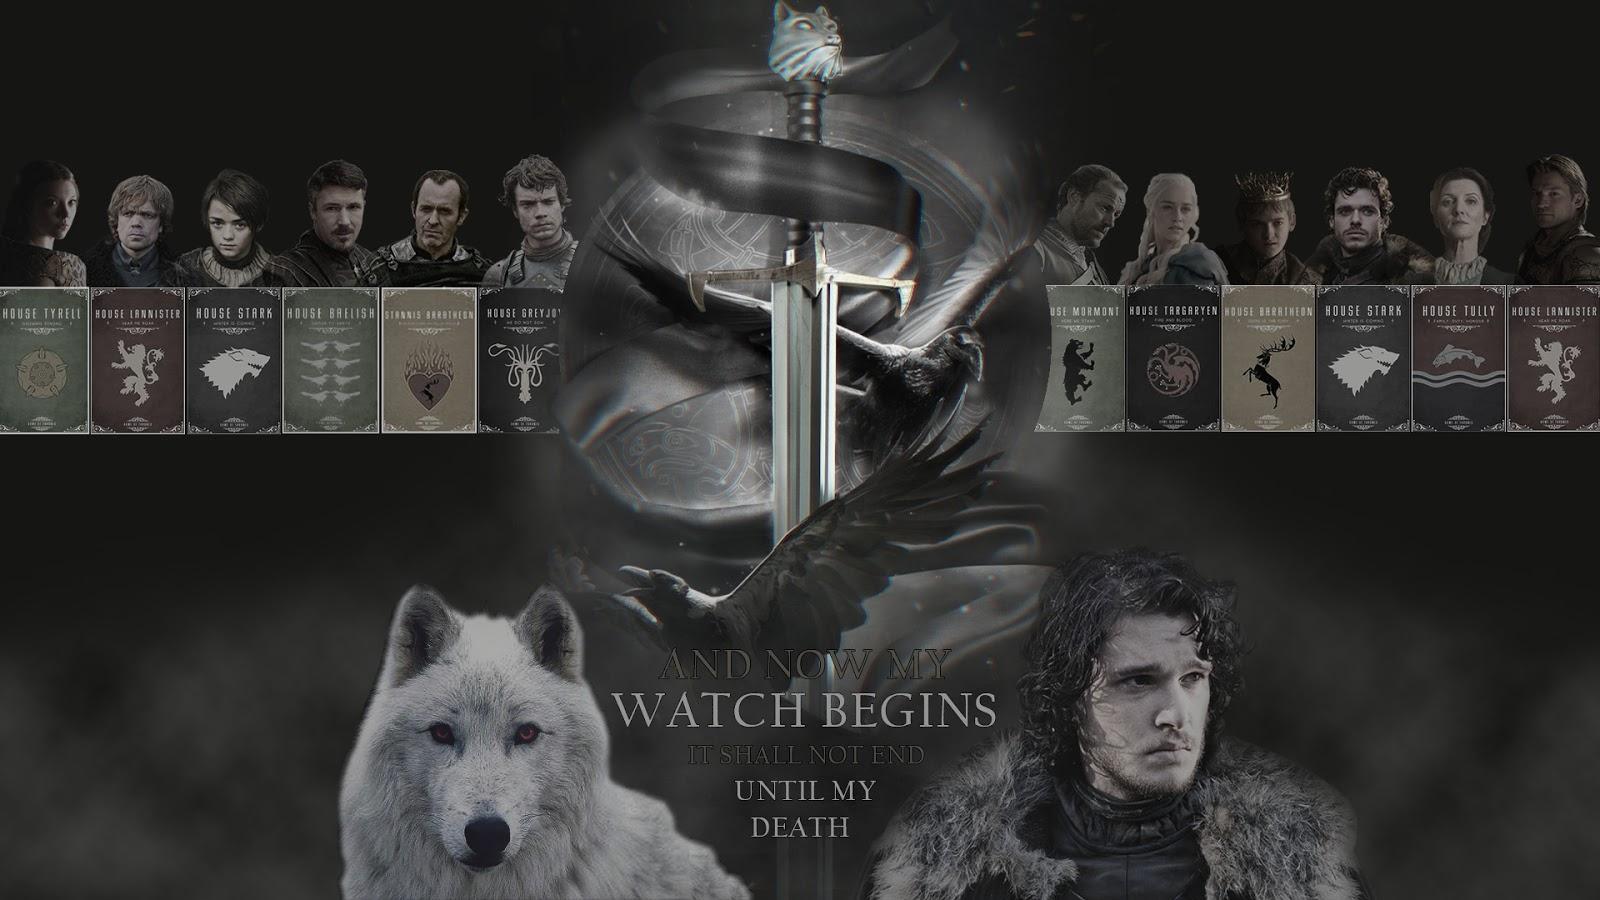 Game Of Thrones Season 6 Wallpapers: Fond D'écran Game Of Thrones (Le Trône De Fer